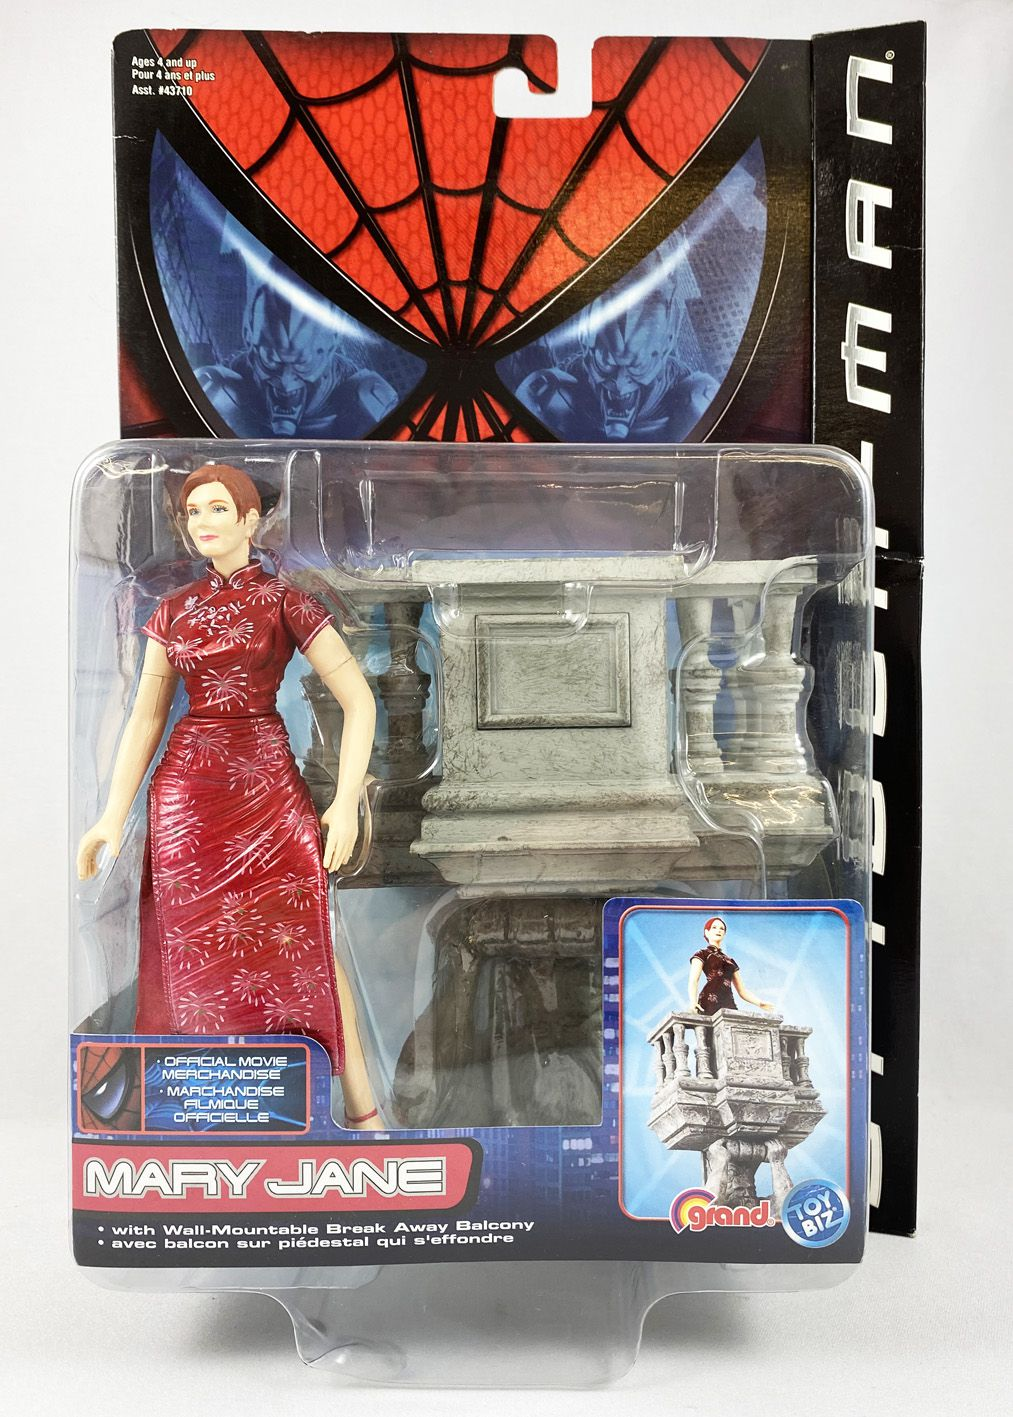 Spider-Man (Film 2002) - Toy Biz - Mary Jane